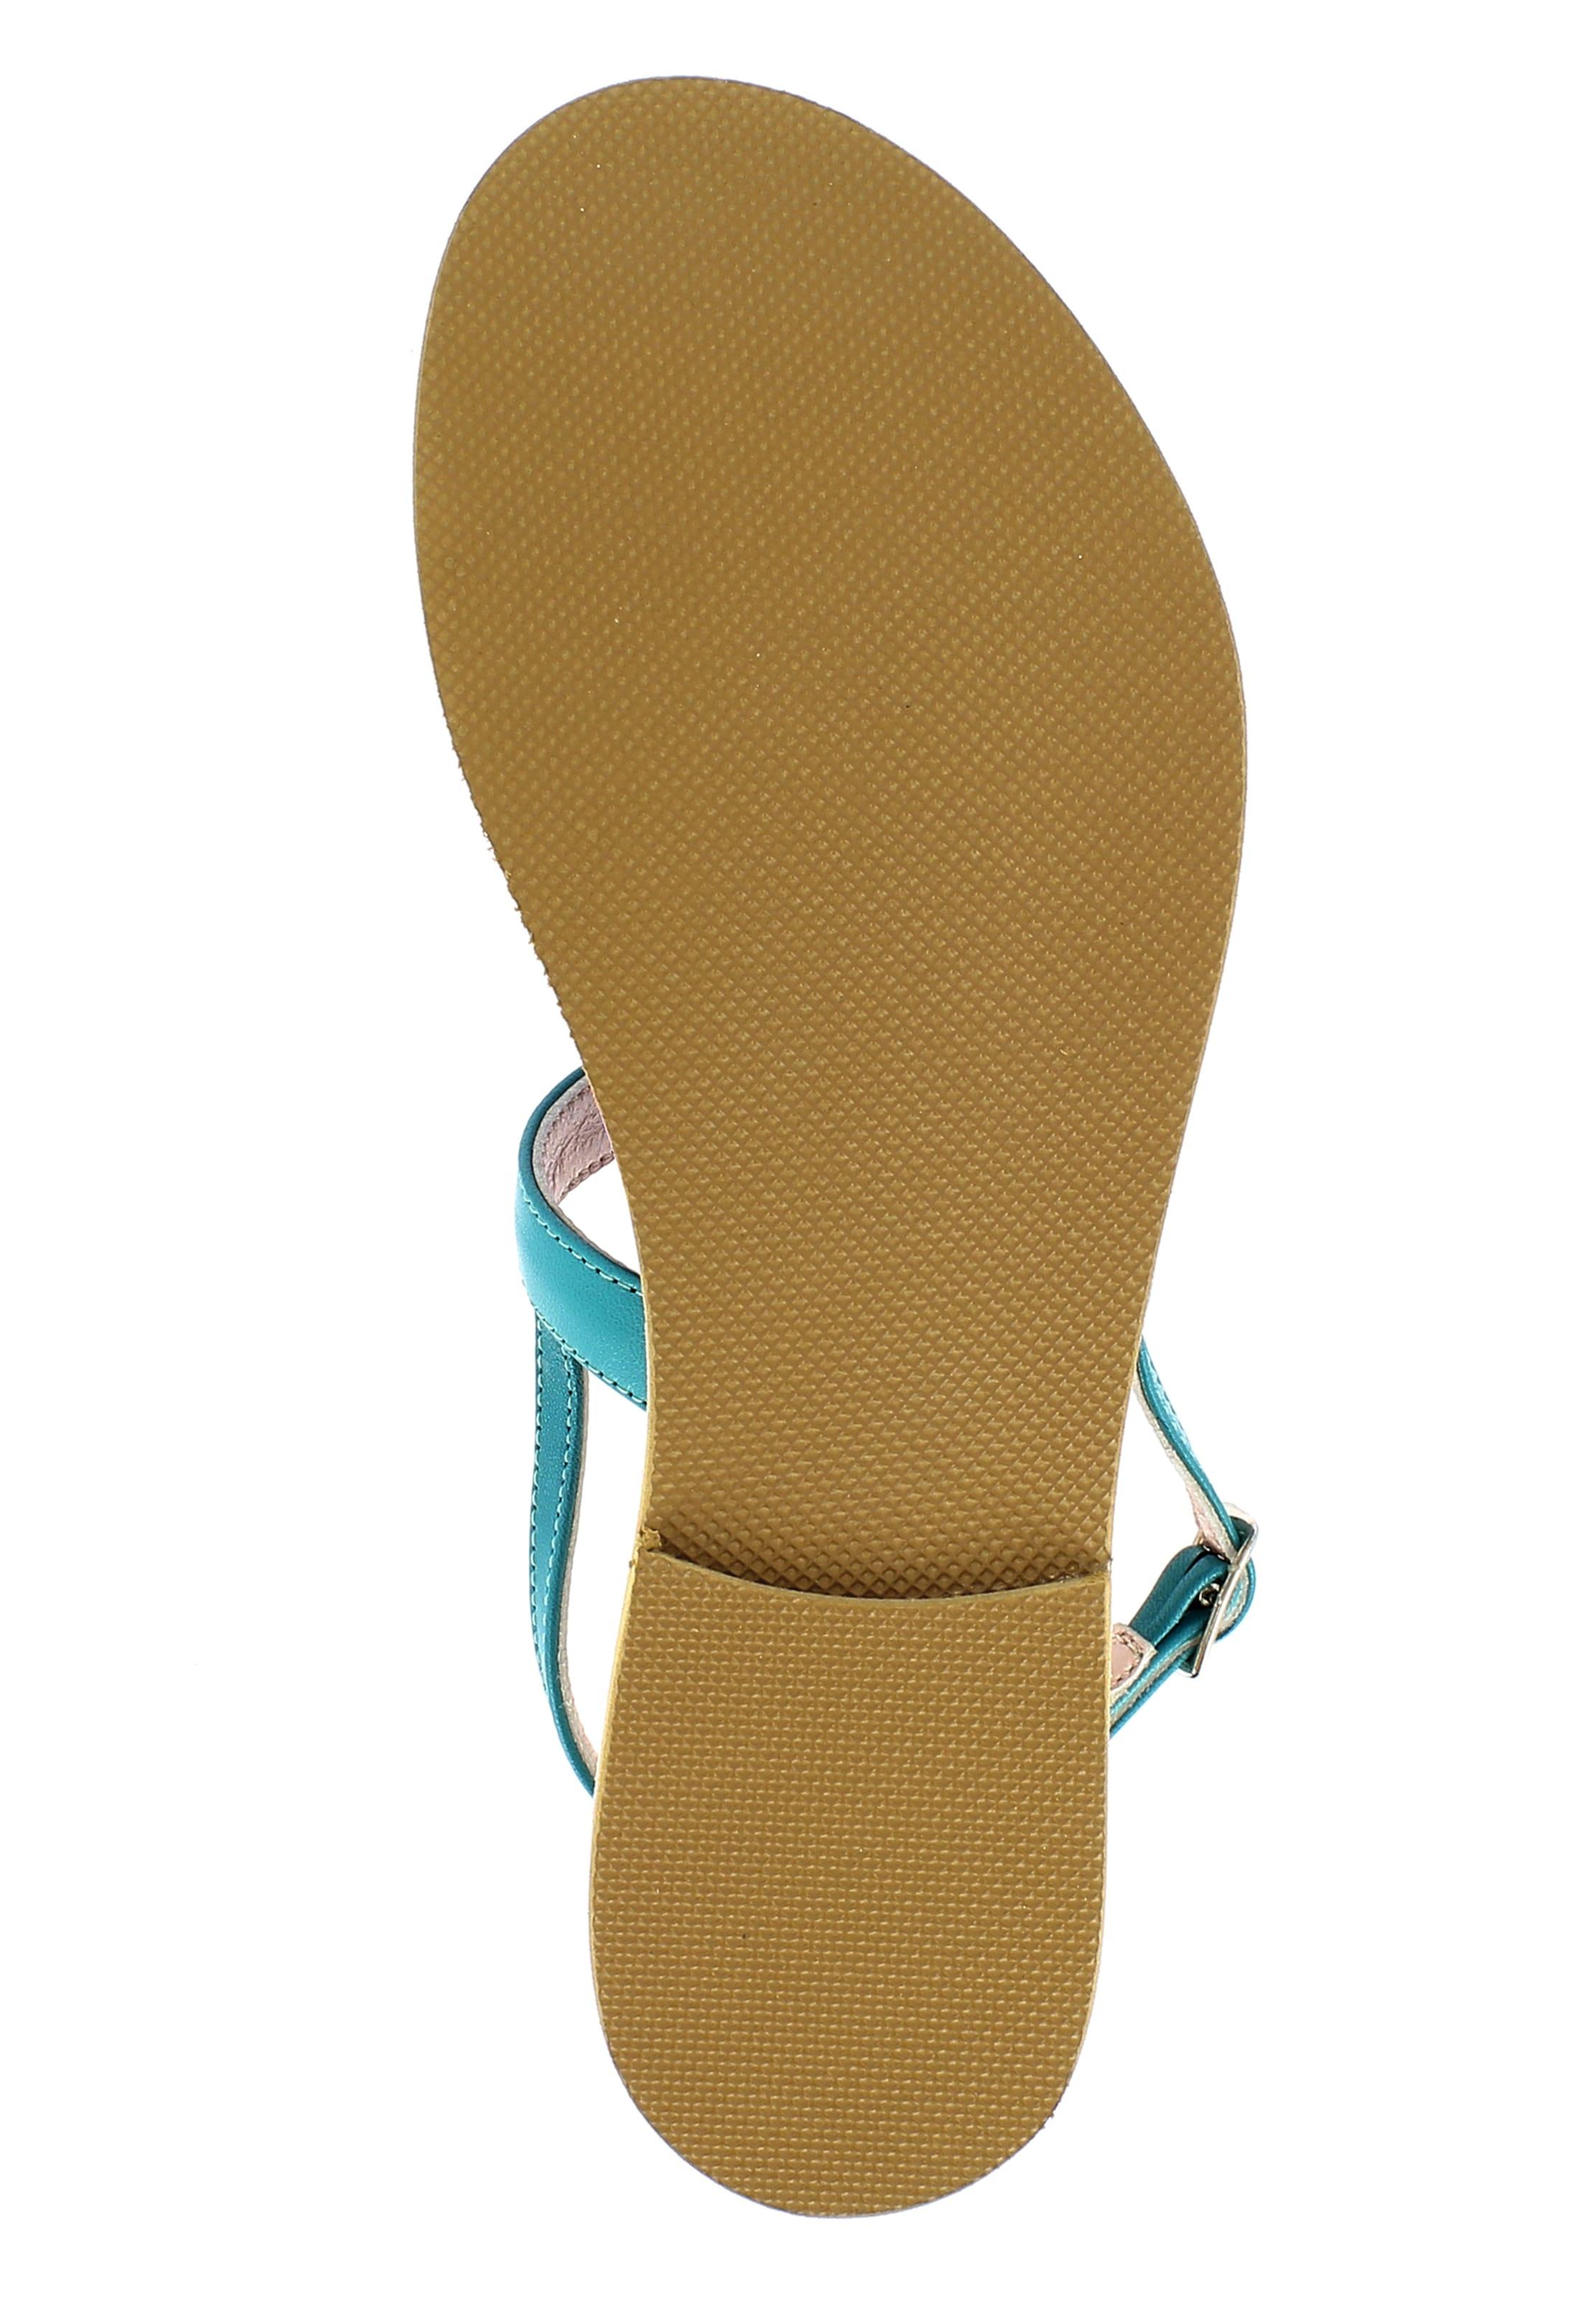 Damen Evita Evita Damen In Sandale Petrol 34qARcjL5S